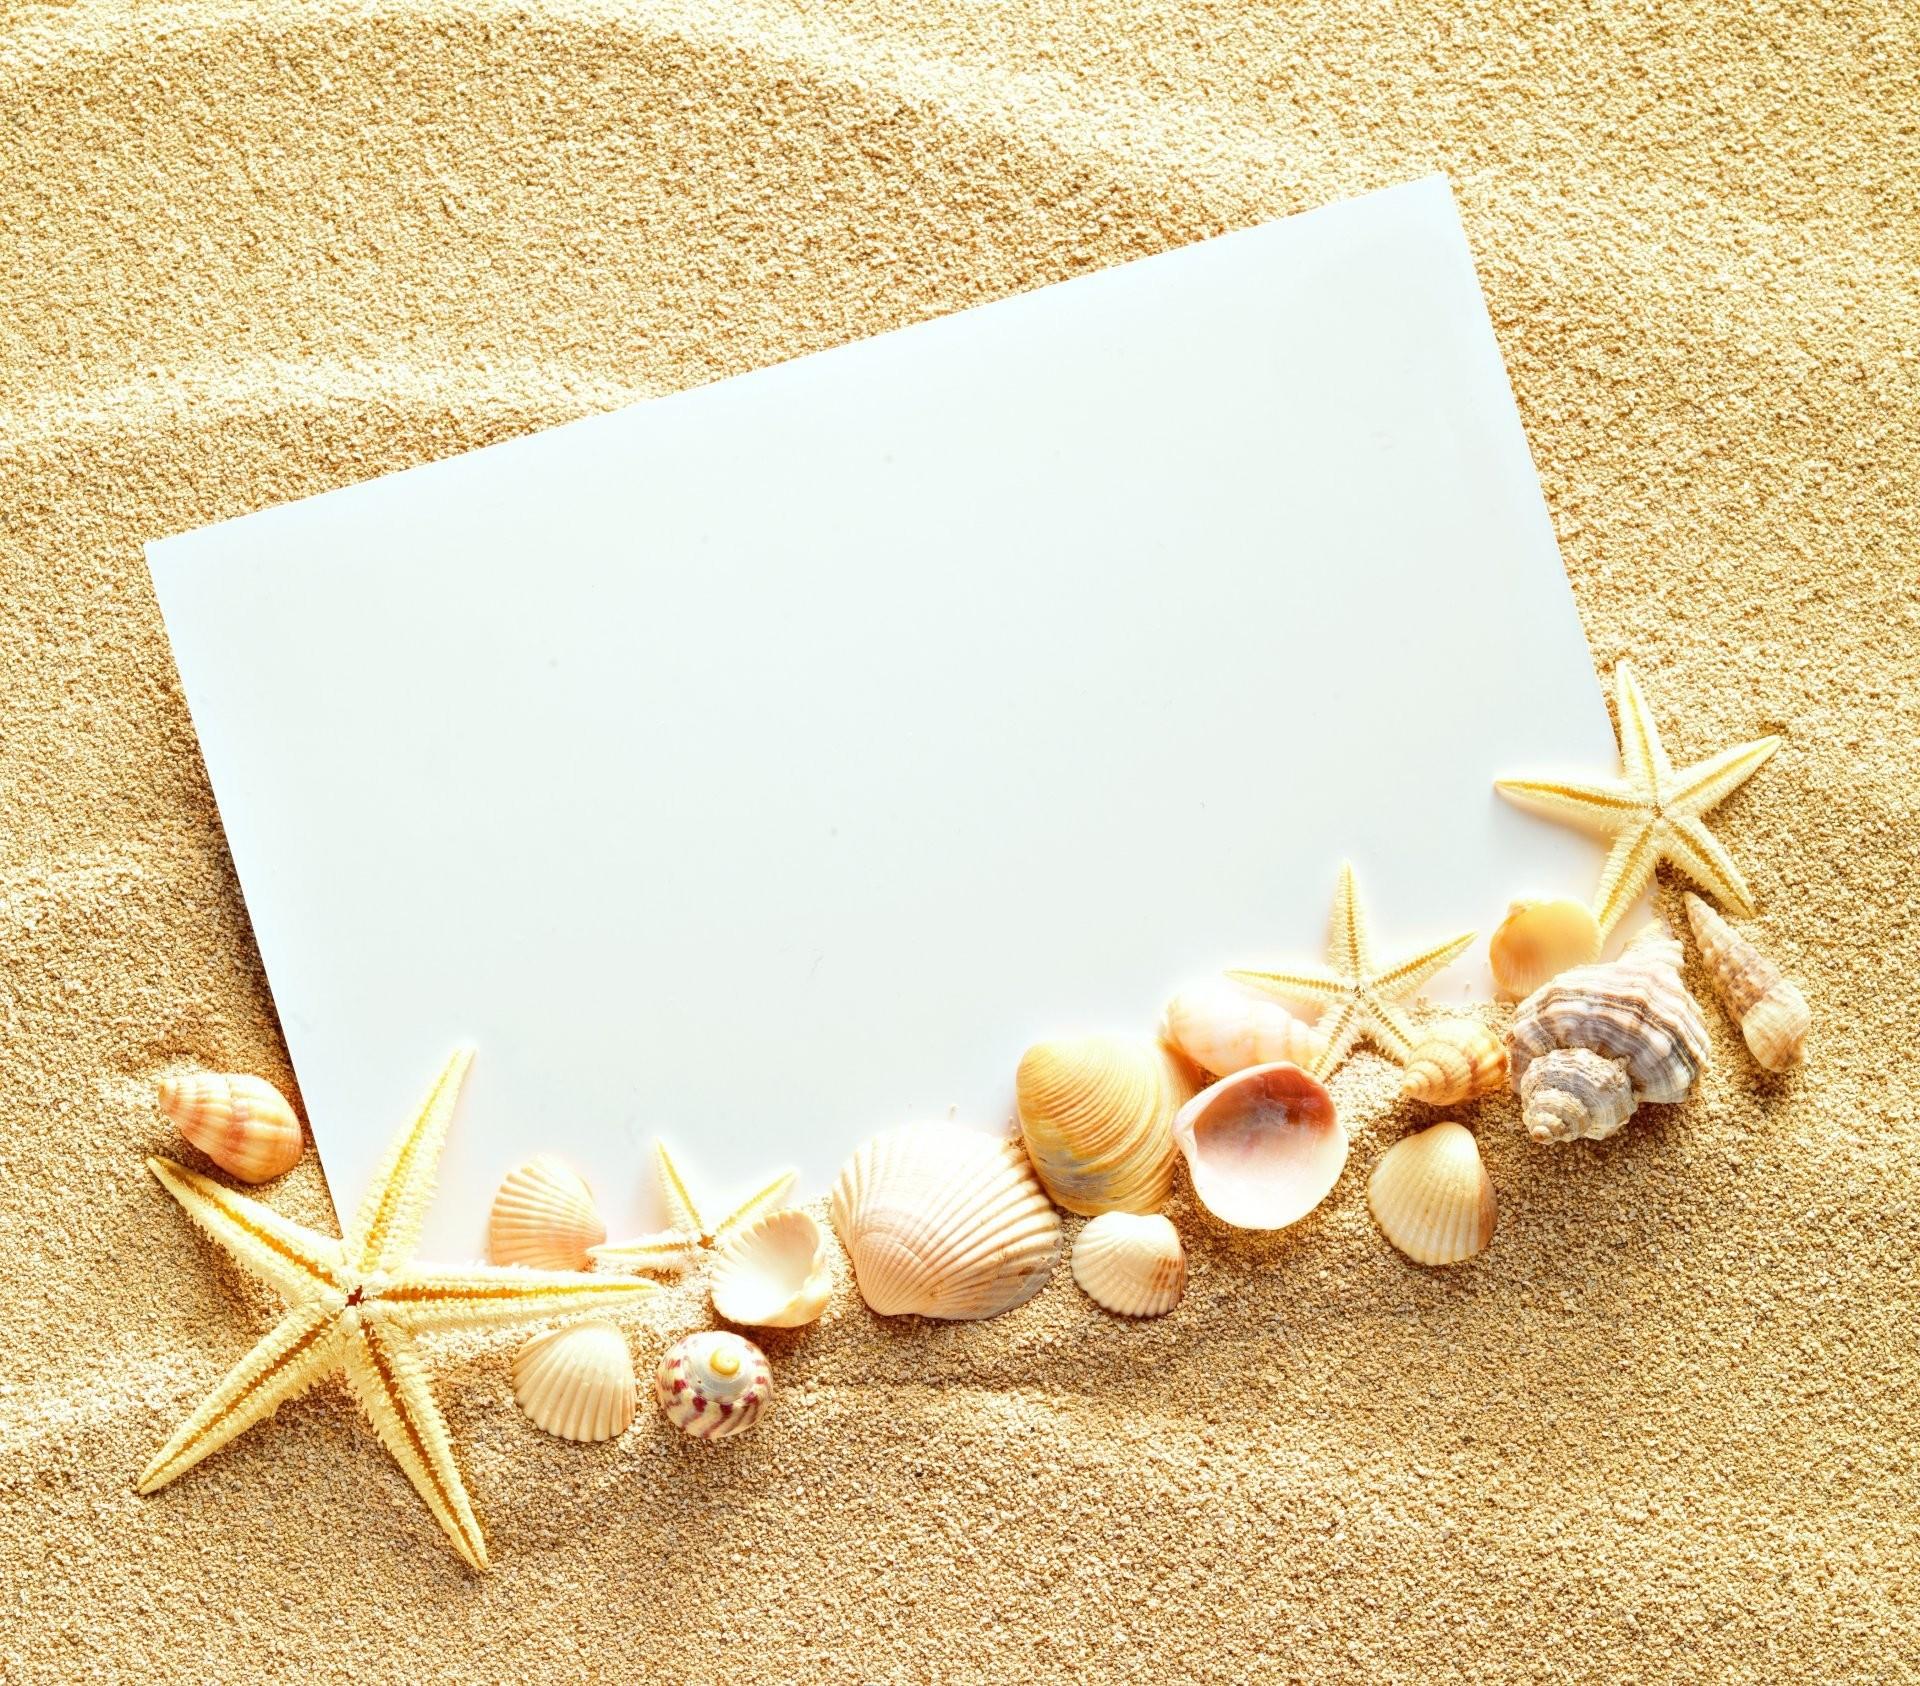 Seashell Backgrounds 43 Images